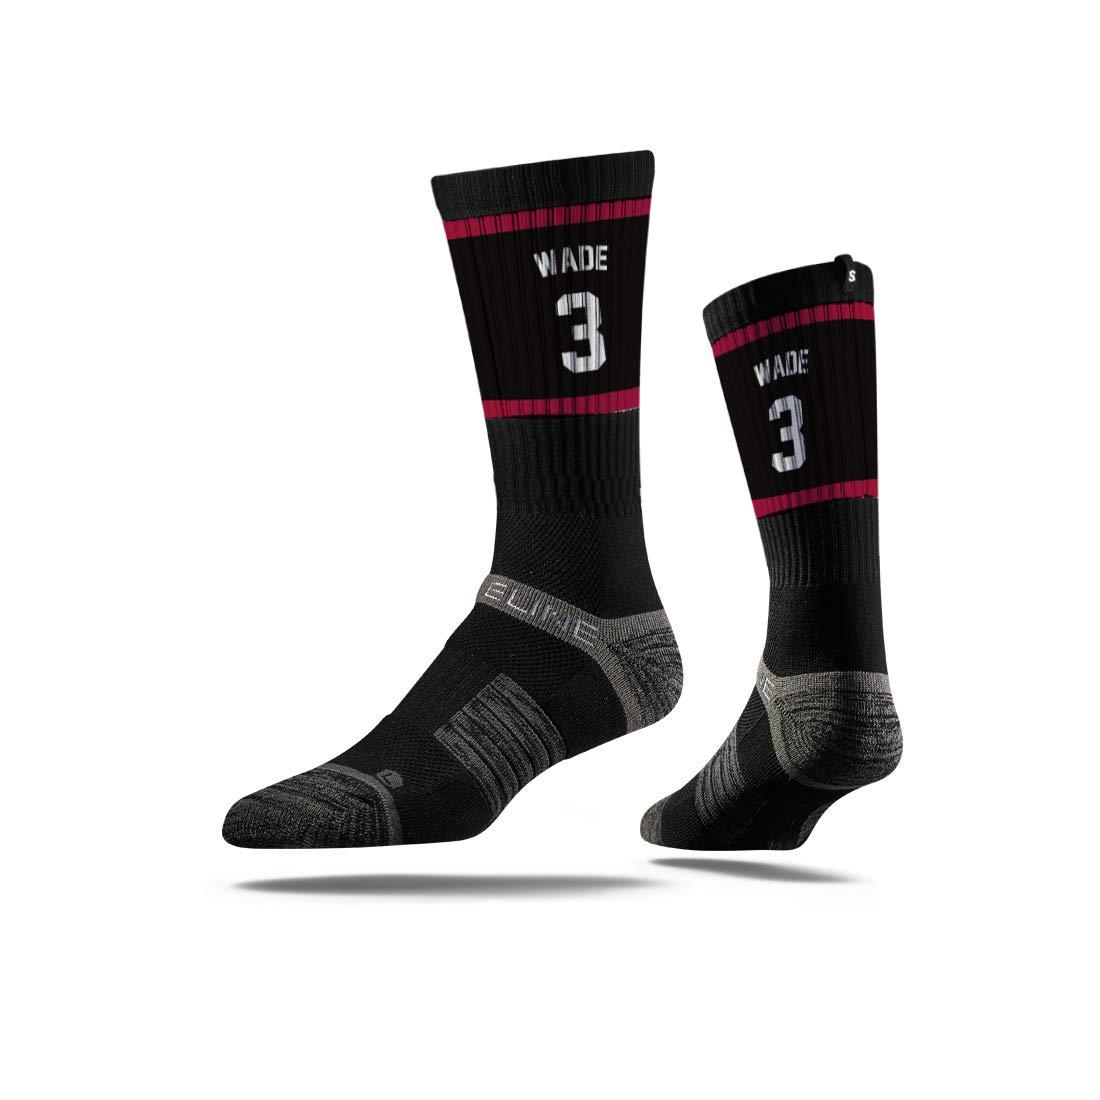 Strideline NBA Miami Heat Dwyane Wade Jersey Premium Athletic Crew Socks Black One Size